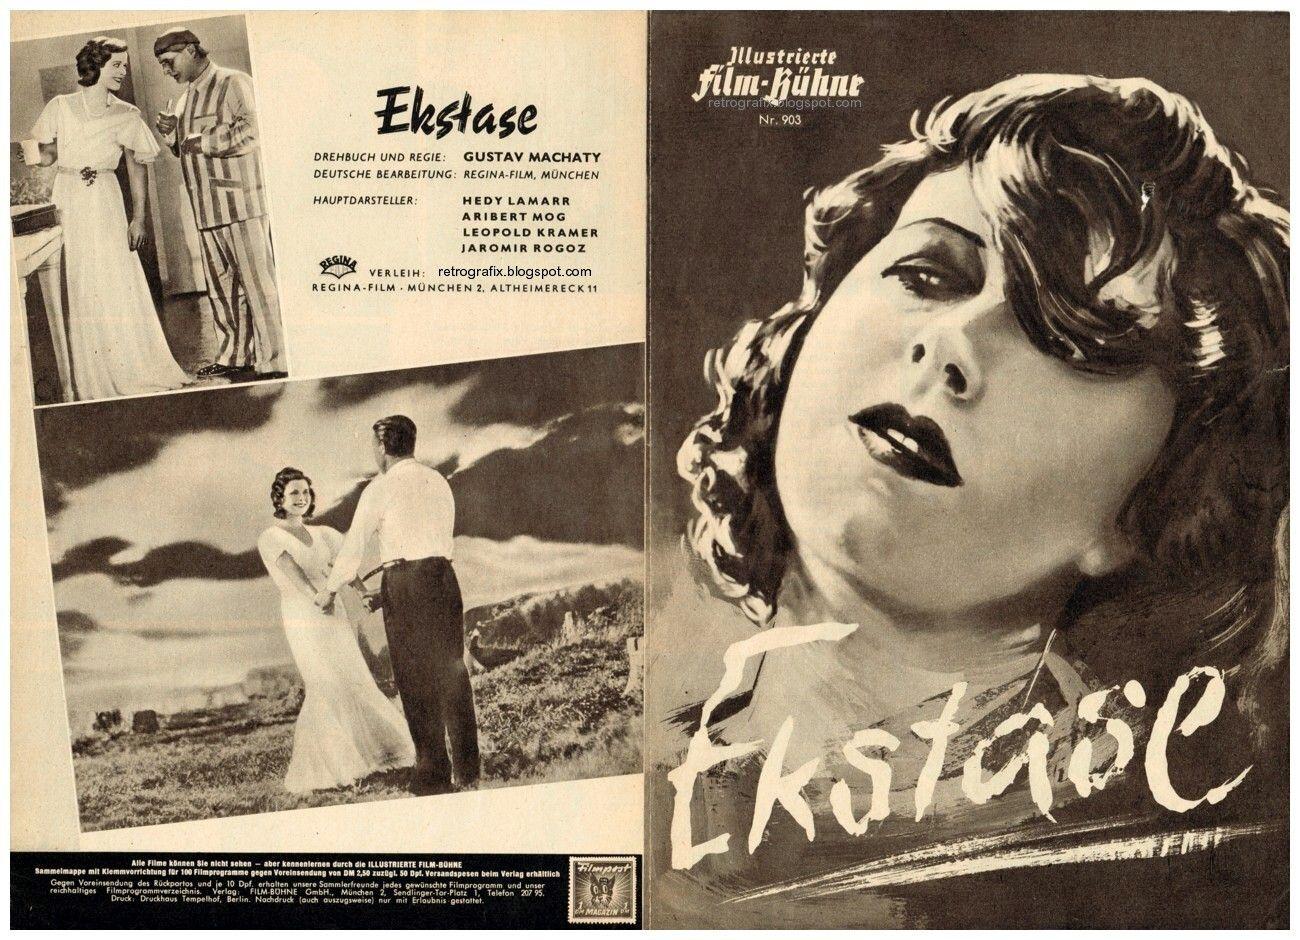 ekstase 1933 - Google zoeken | Hedy lamarr, Film, Steamy